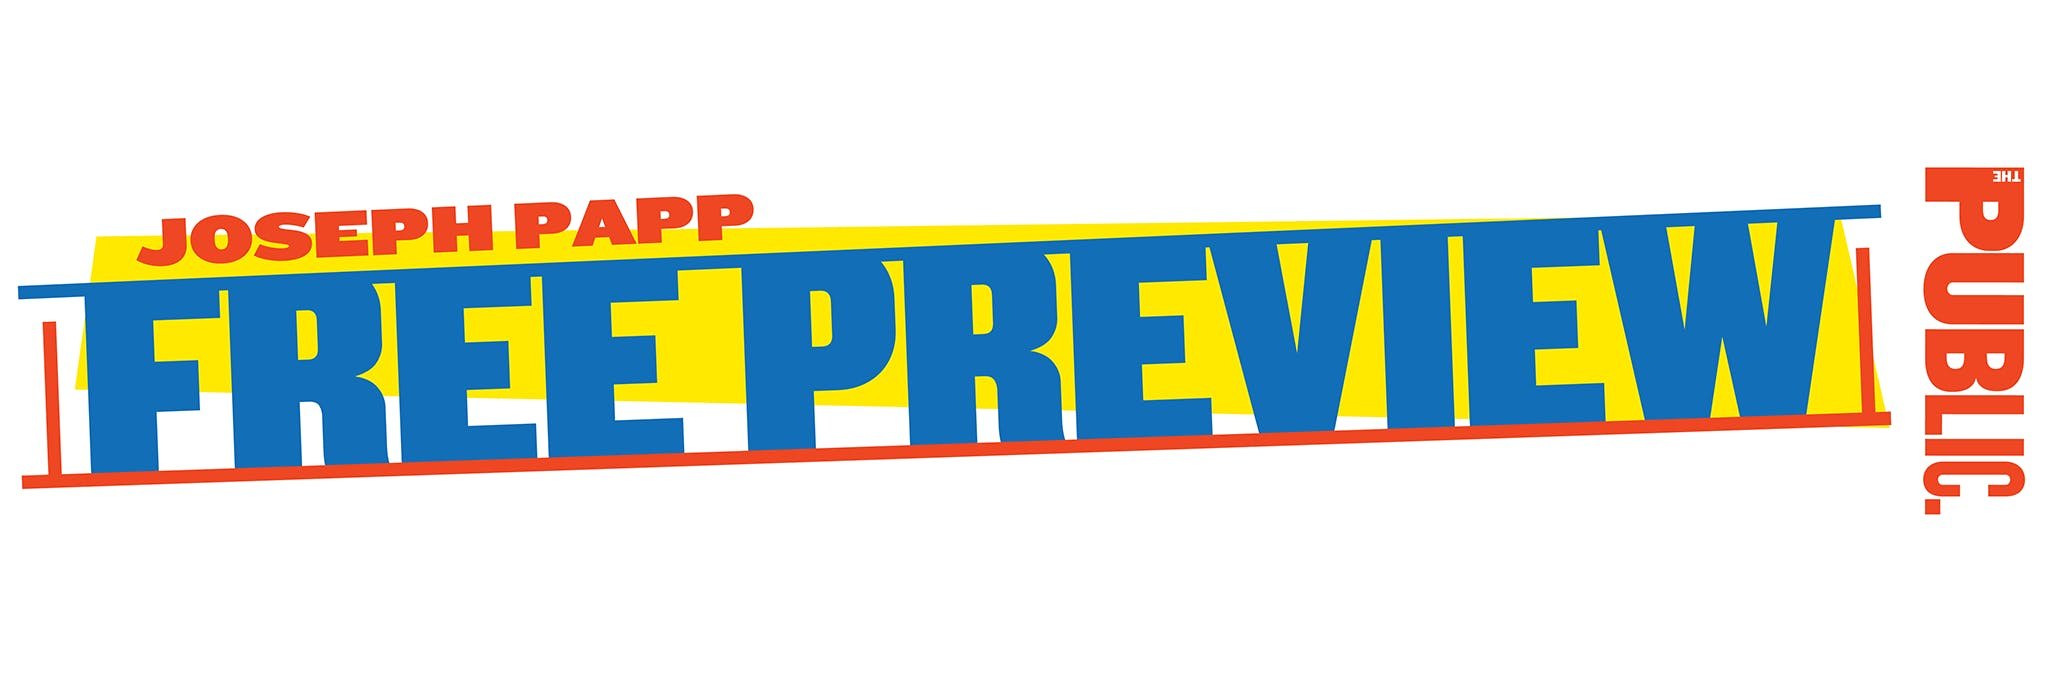 Joseph Papp Free Preview: Soft Power Logo